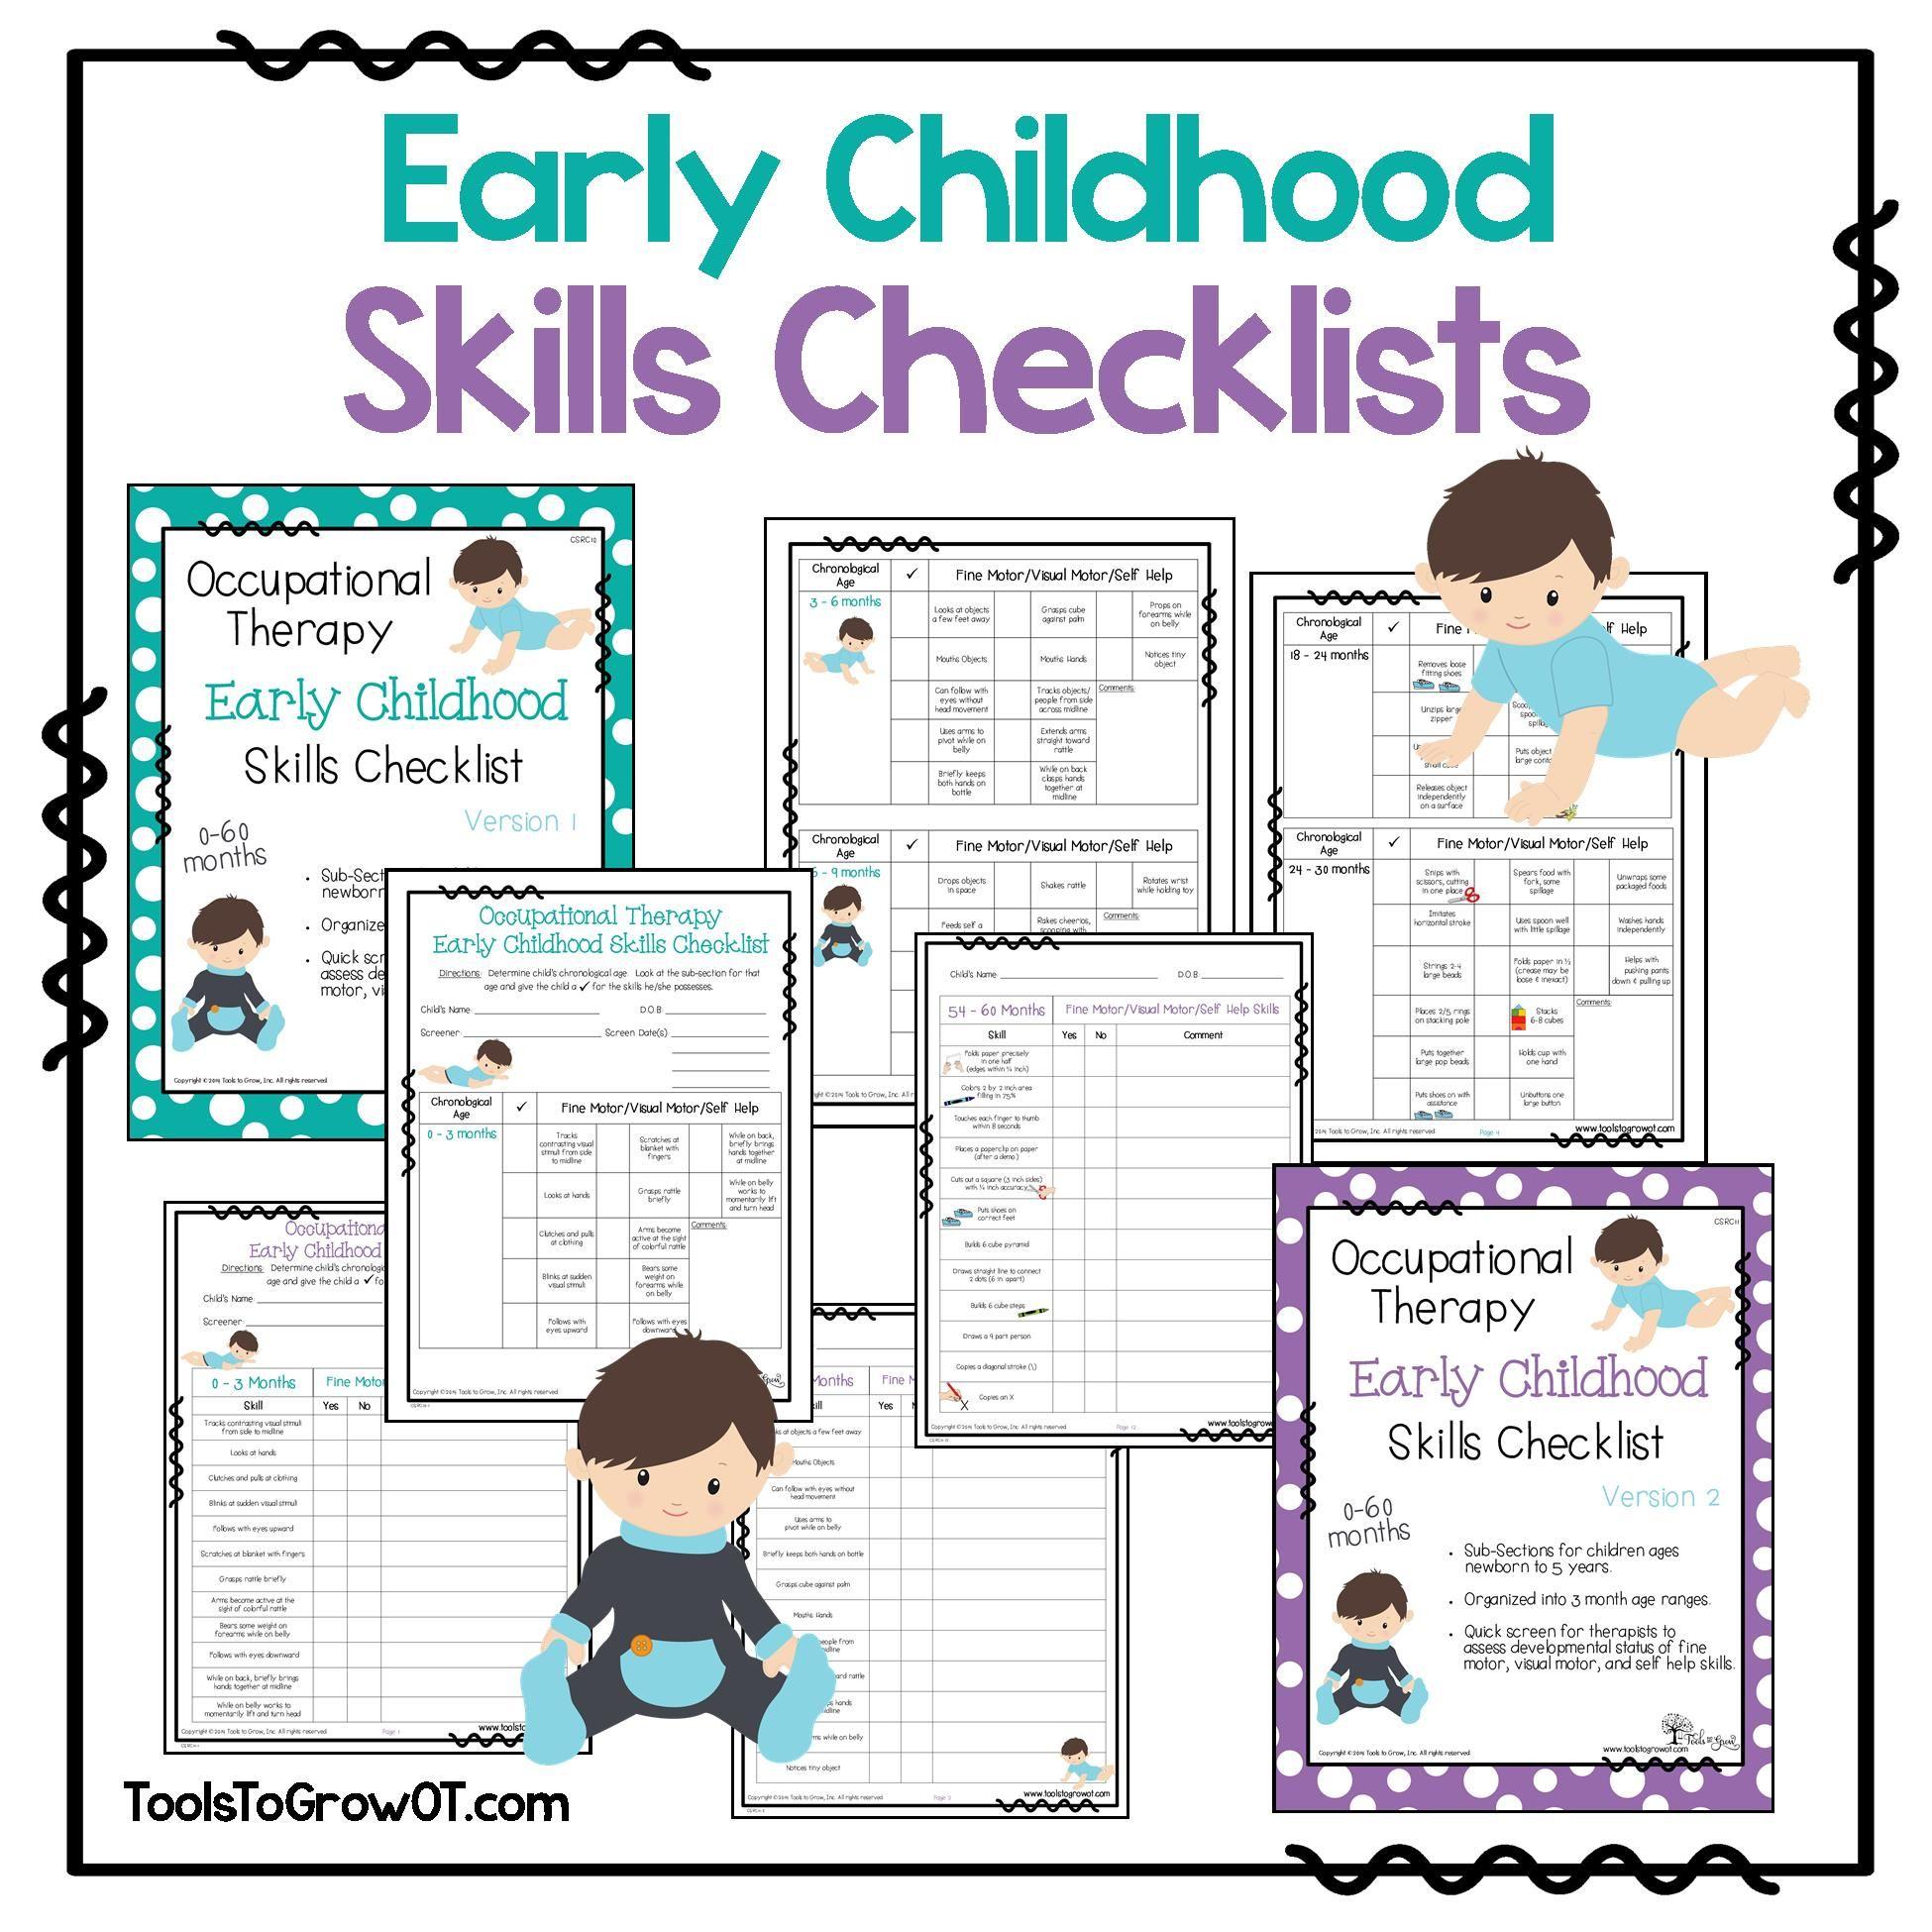 Early Childhood Skills Checklists